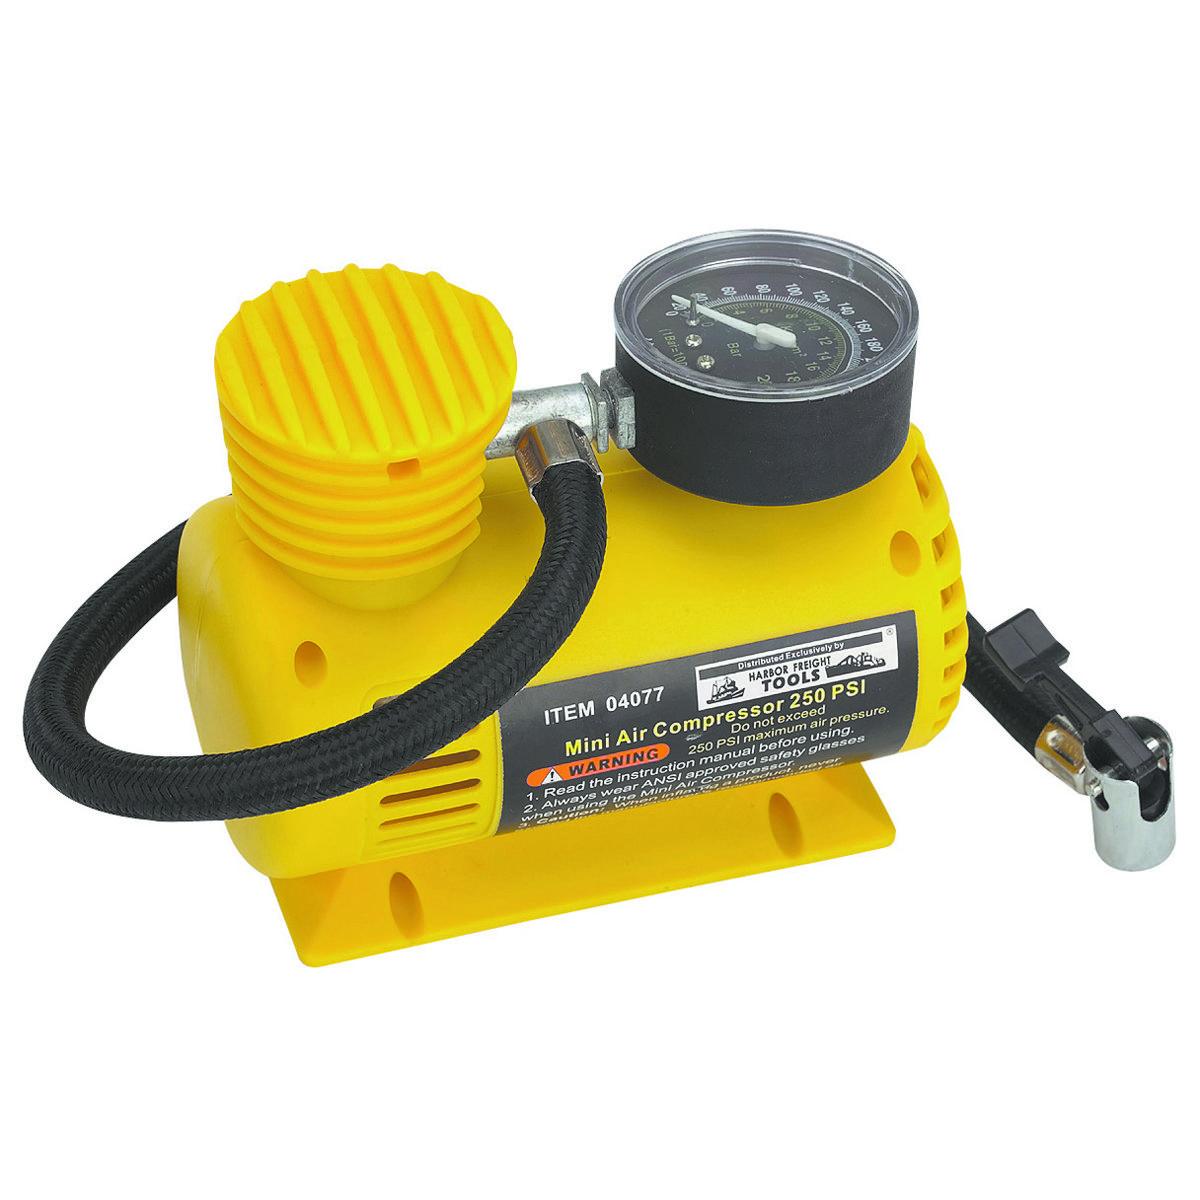 small resolution of 12 volt 250 psi compact air compressor